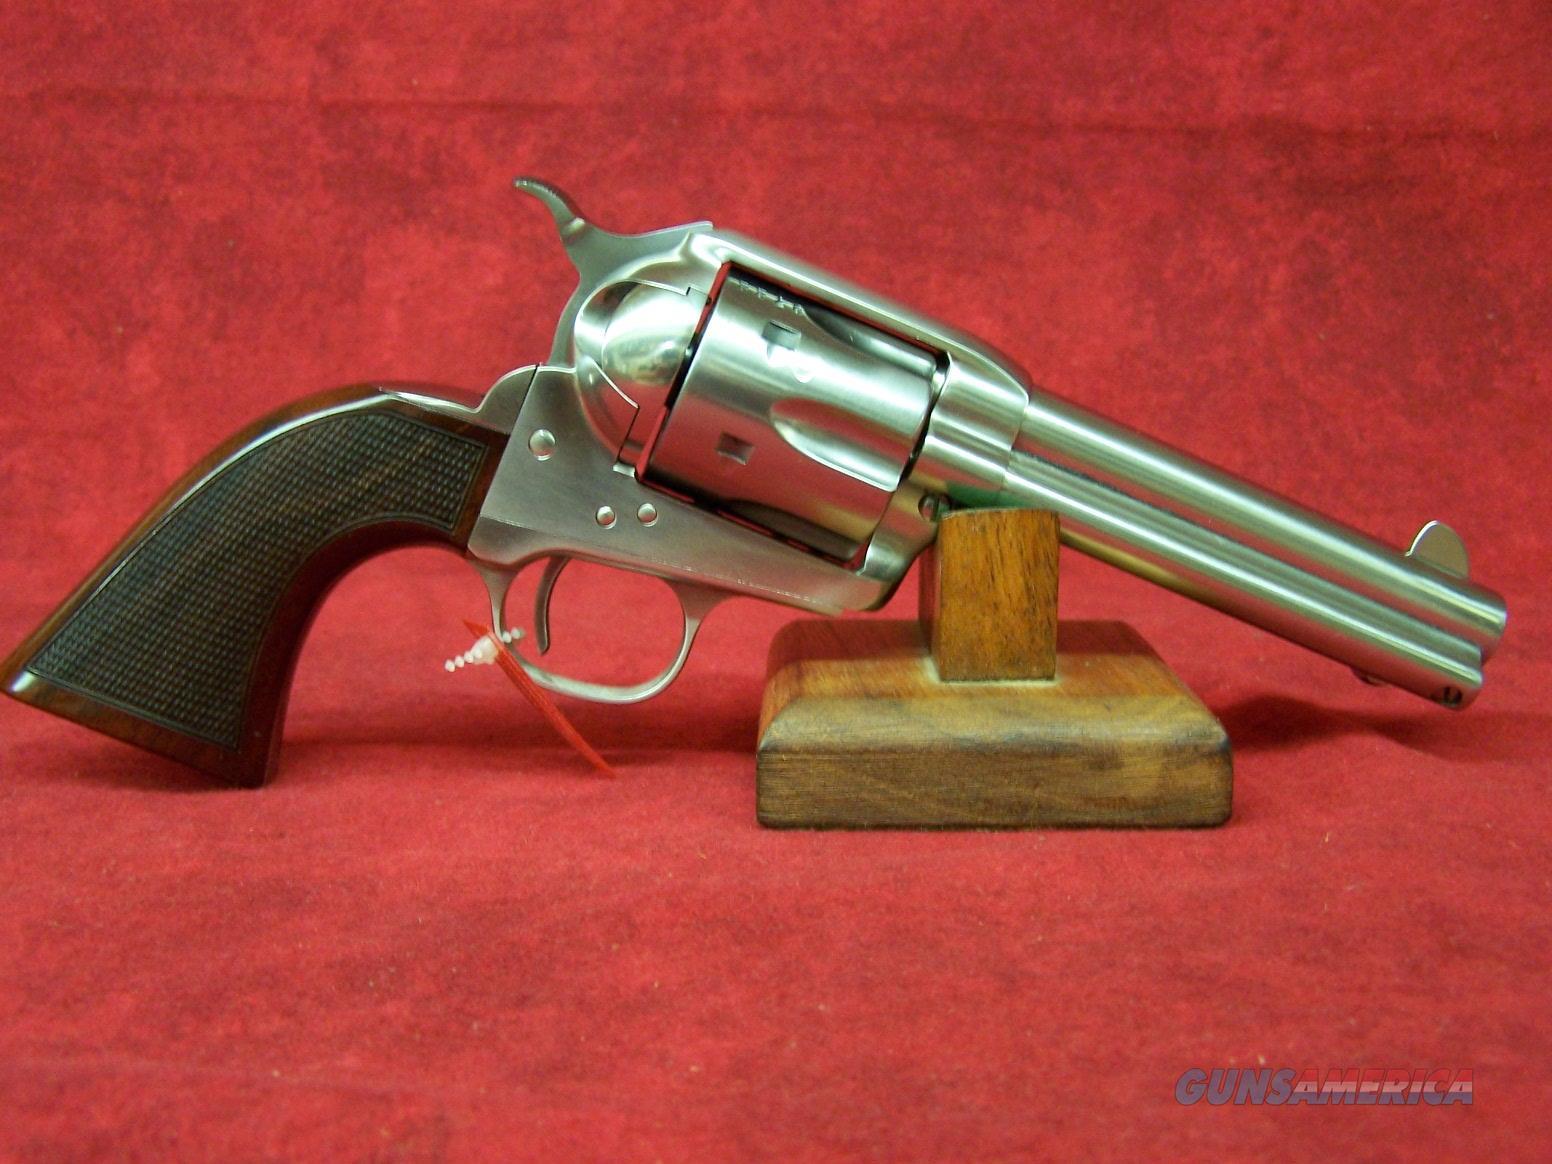 "Uberti 1873 Cattleman II El Patron Competition .357 Mag 4 3/4"" Stainless Steel (345184)   Guns > Pistols > Uberti Pistols > Ctg."